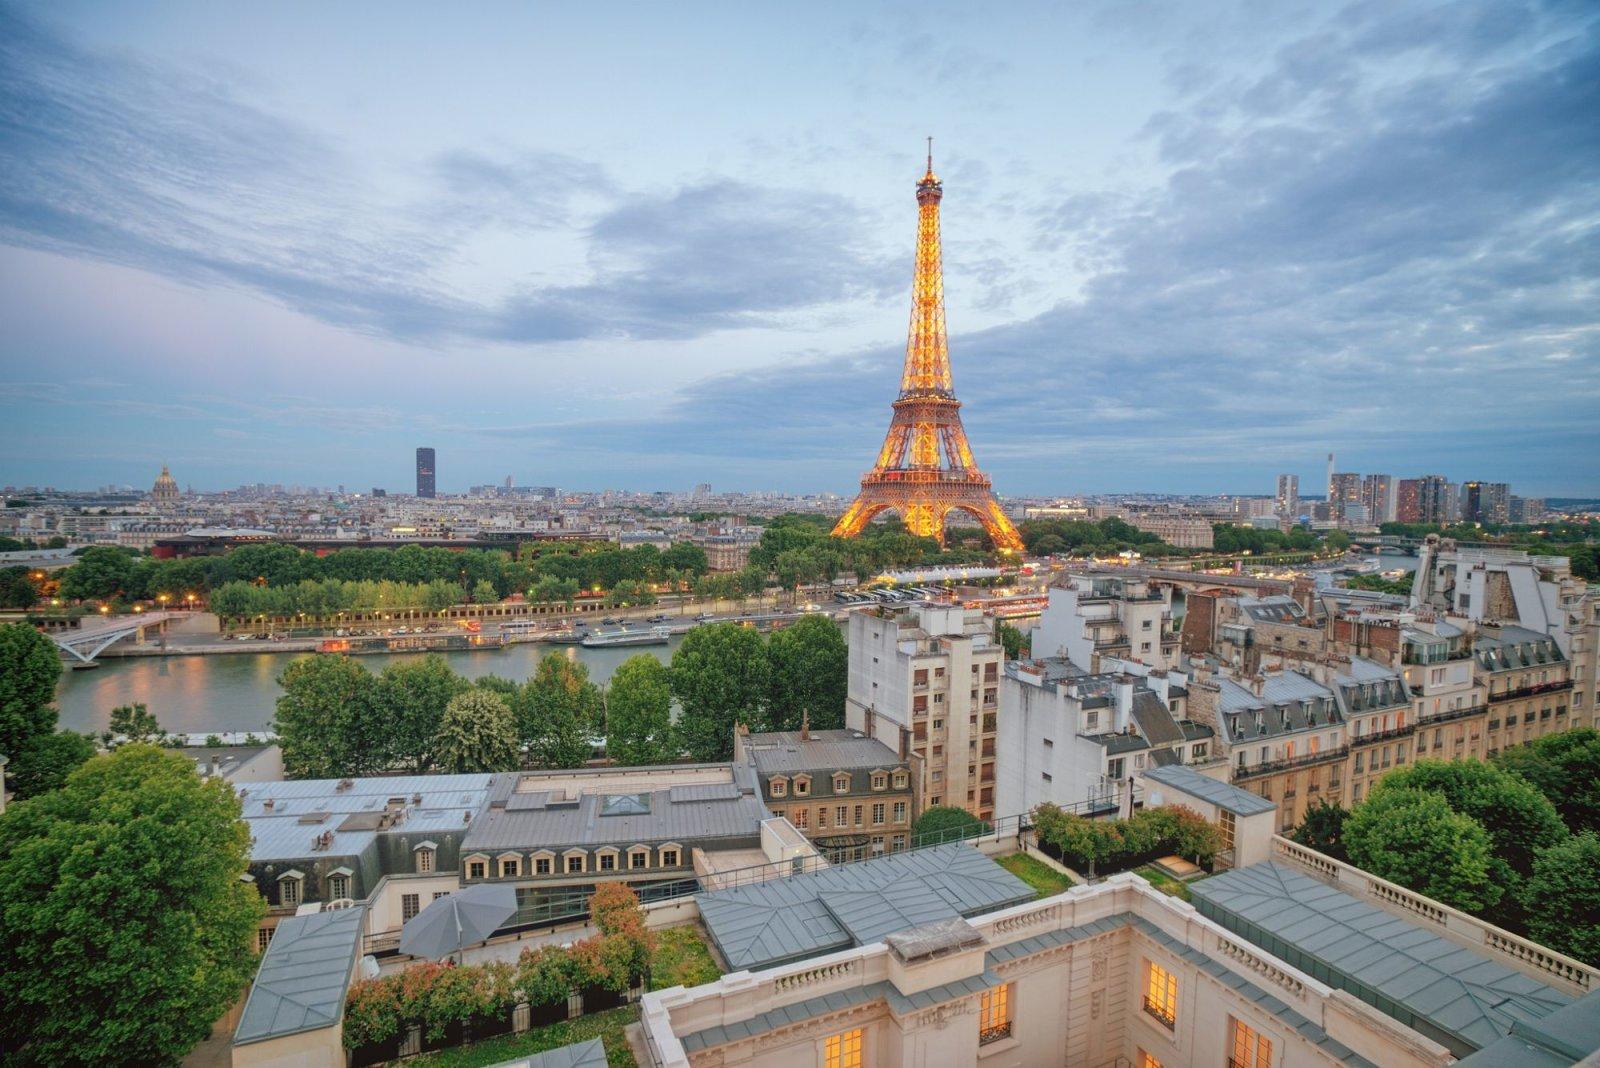 Paris - Eiffel Tower at Dusk